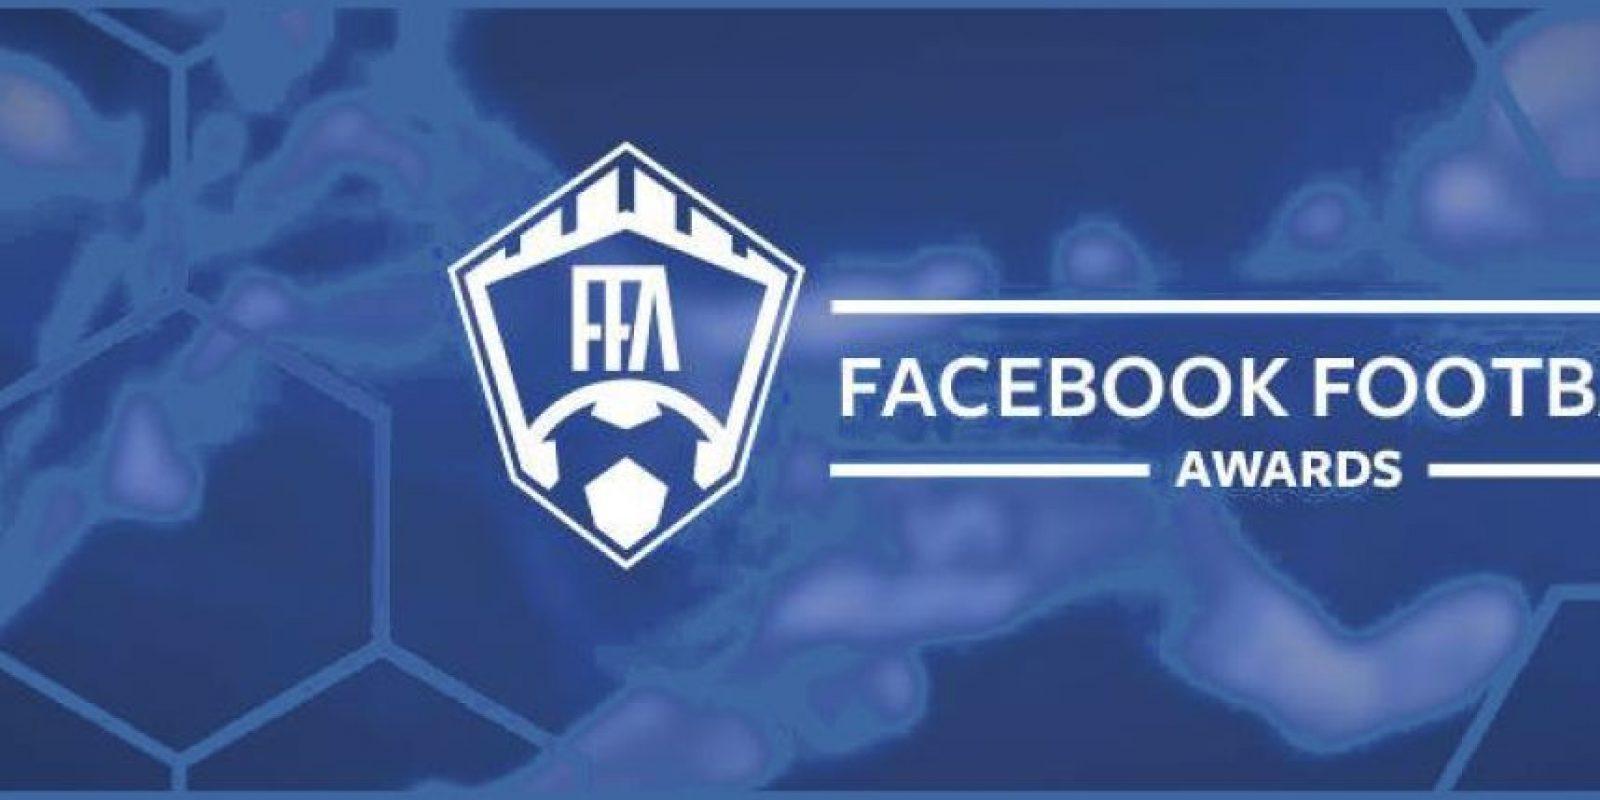 Asi luce el perfil oficial de esta iniciativa de Facebook. Foto:Facebook Football Awards